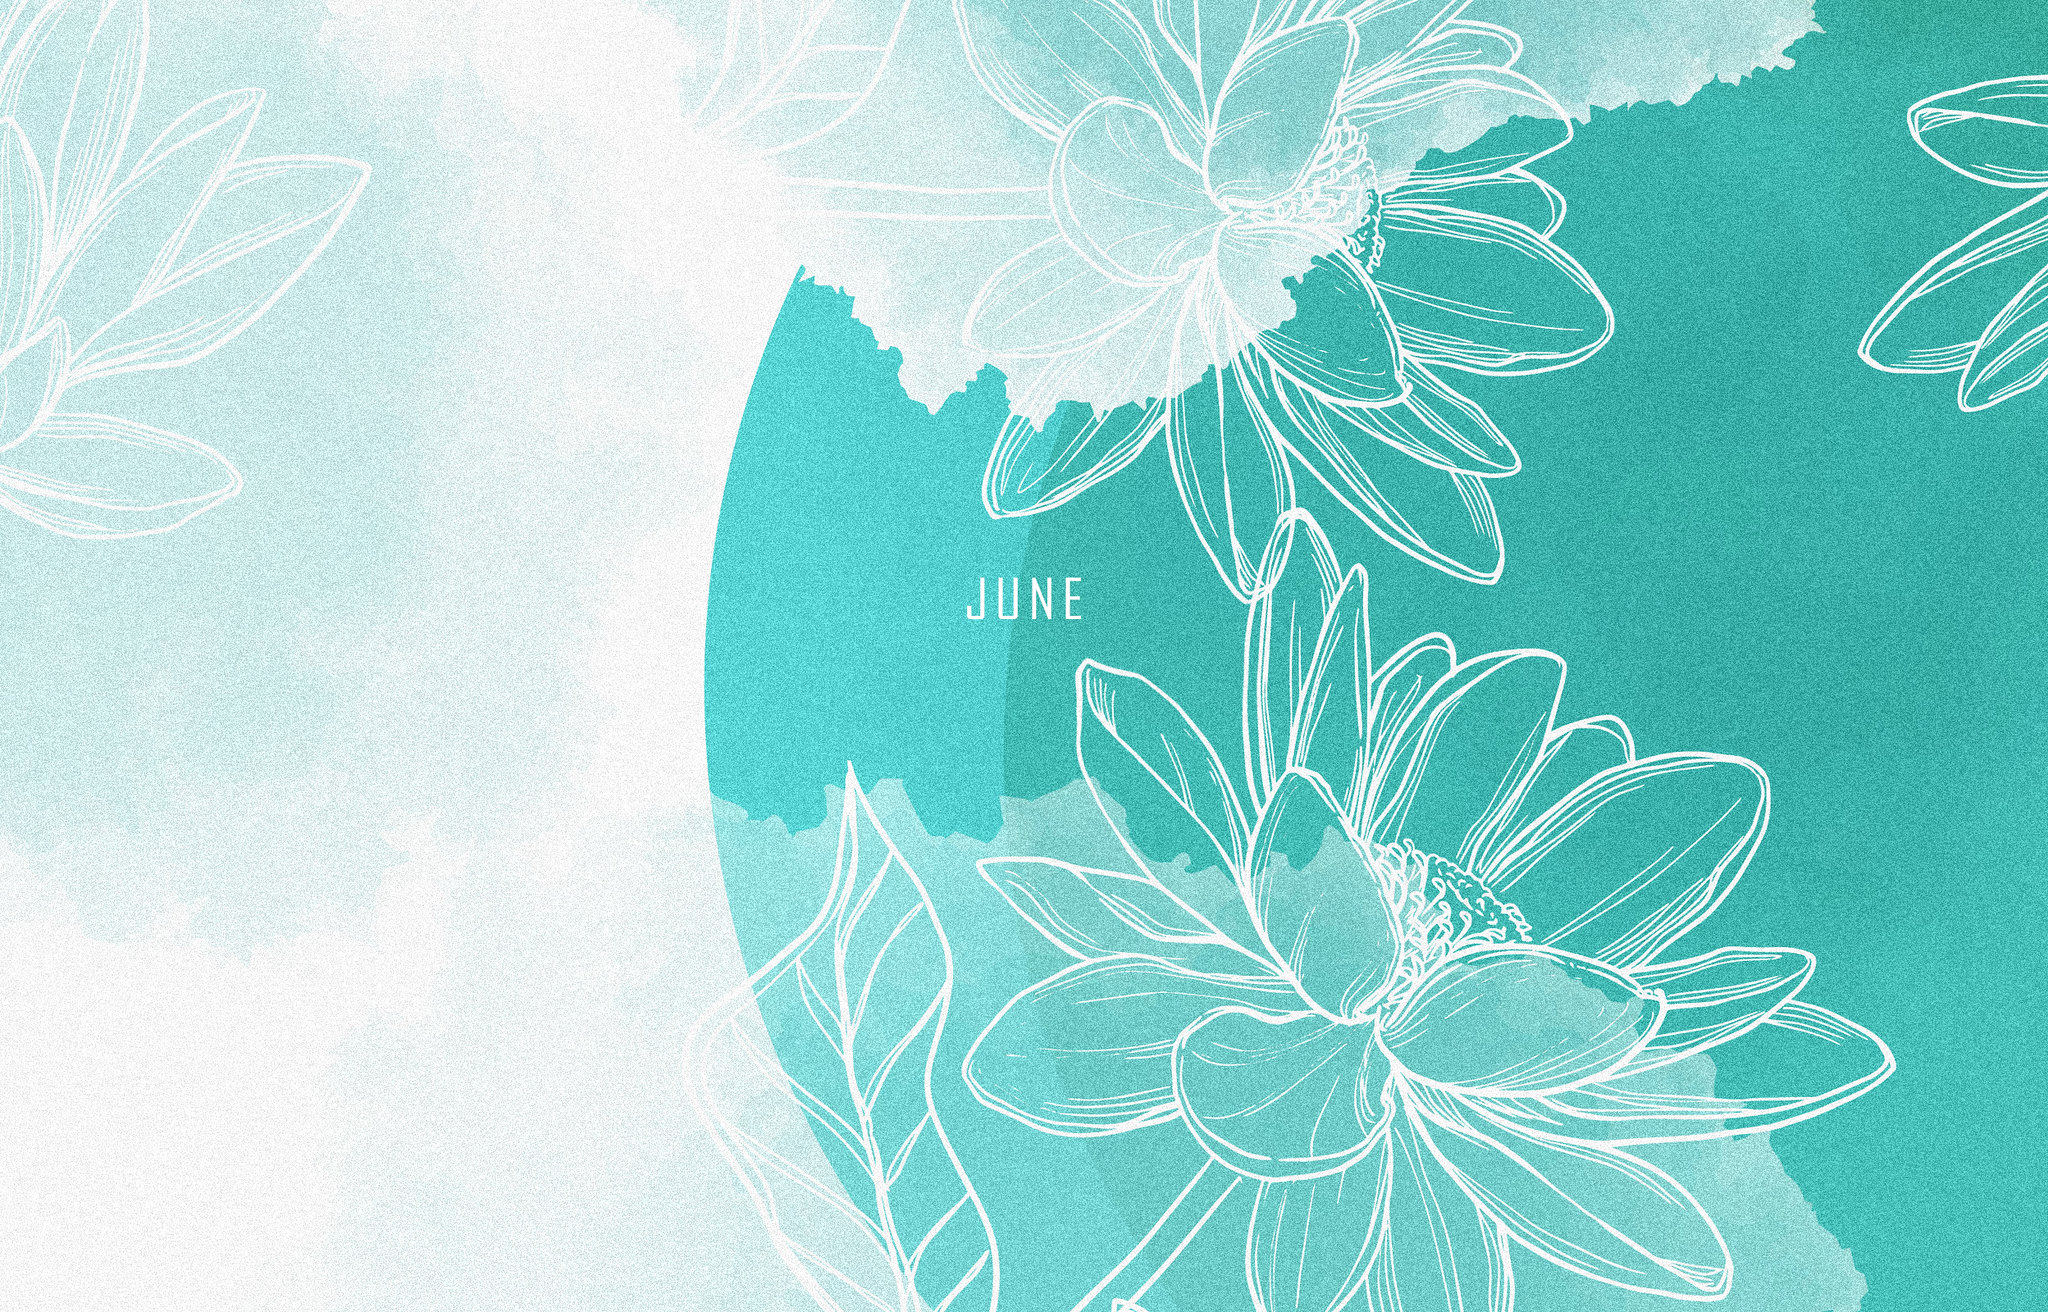 календарь на июнь '21, заставка на пк, district-f.org 12